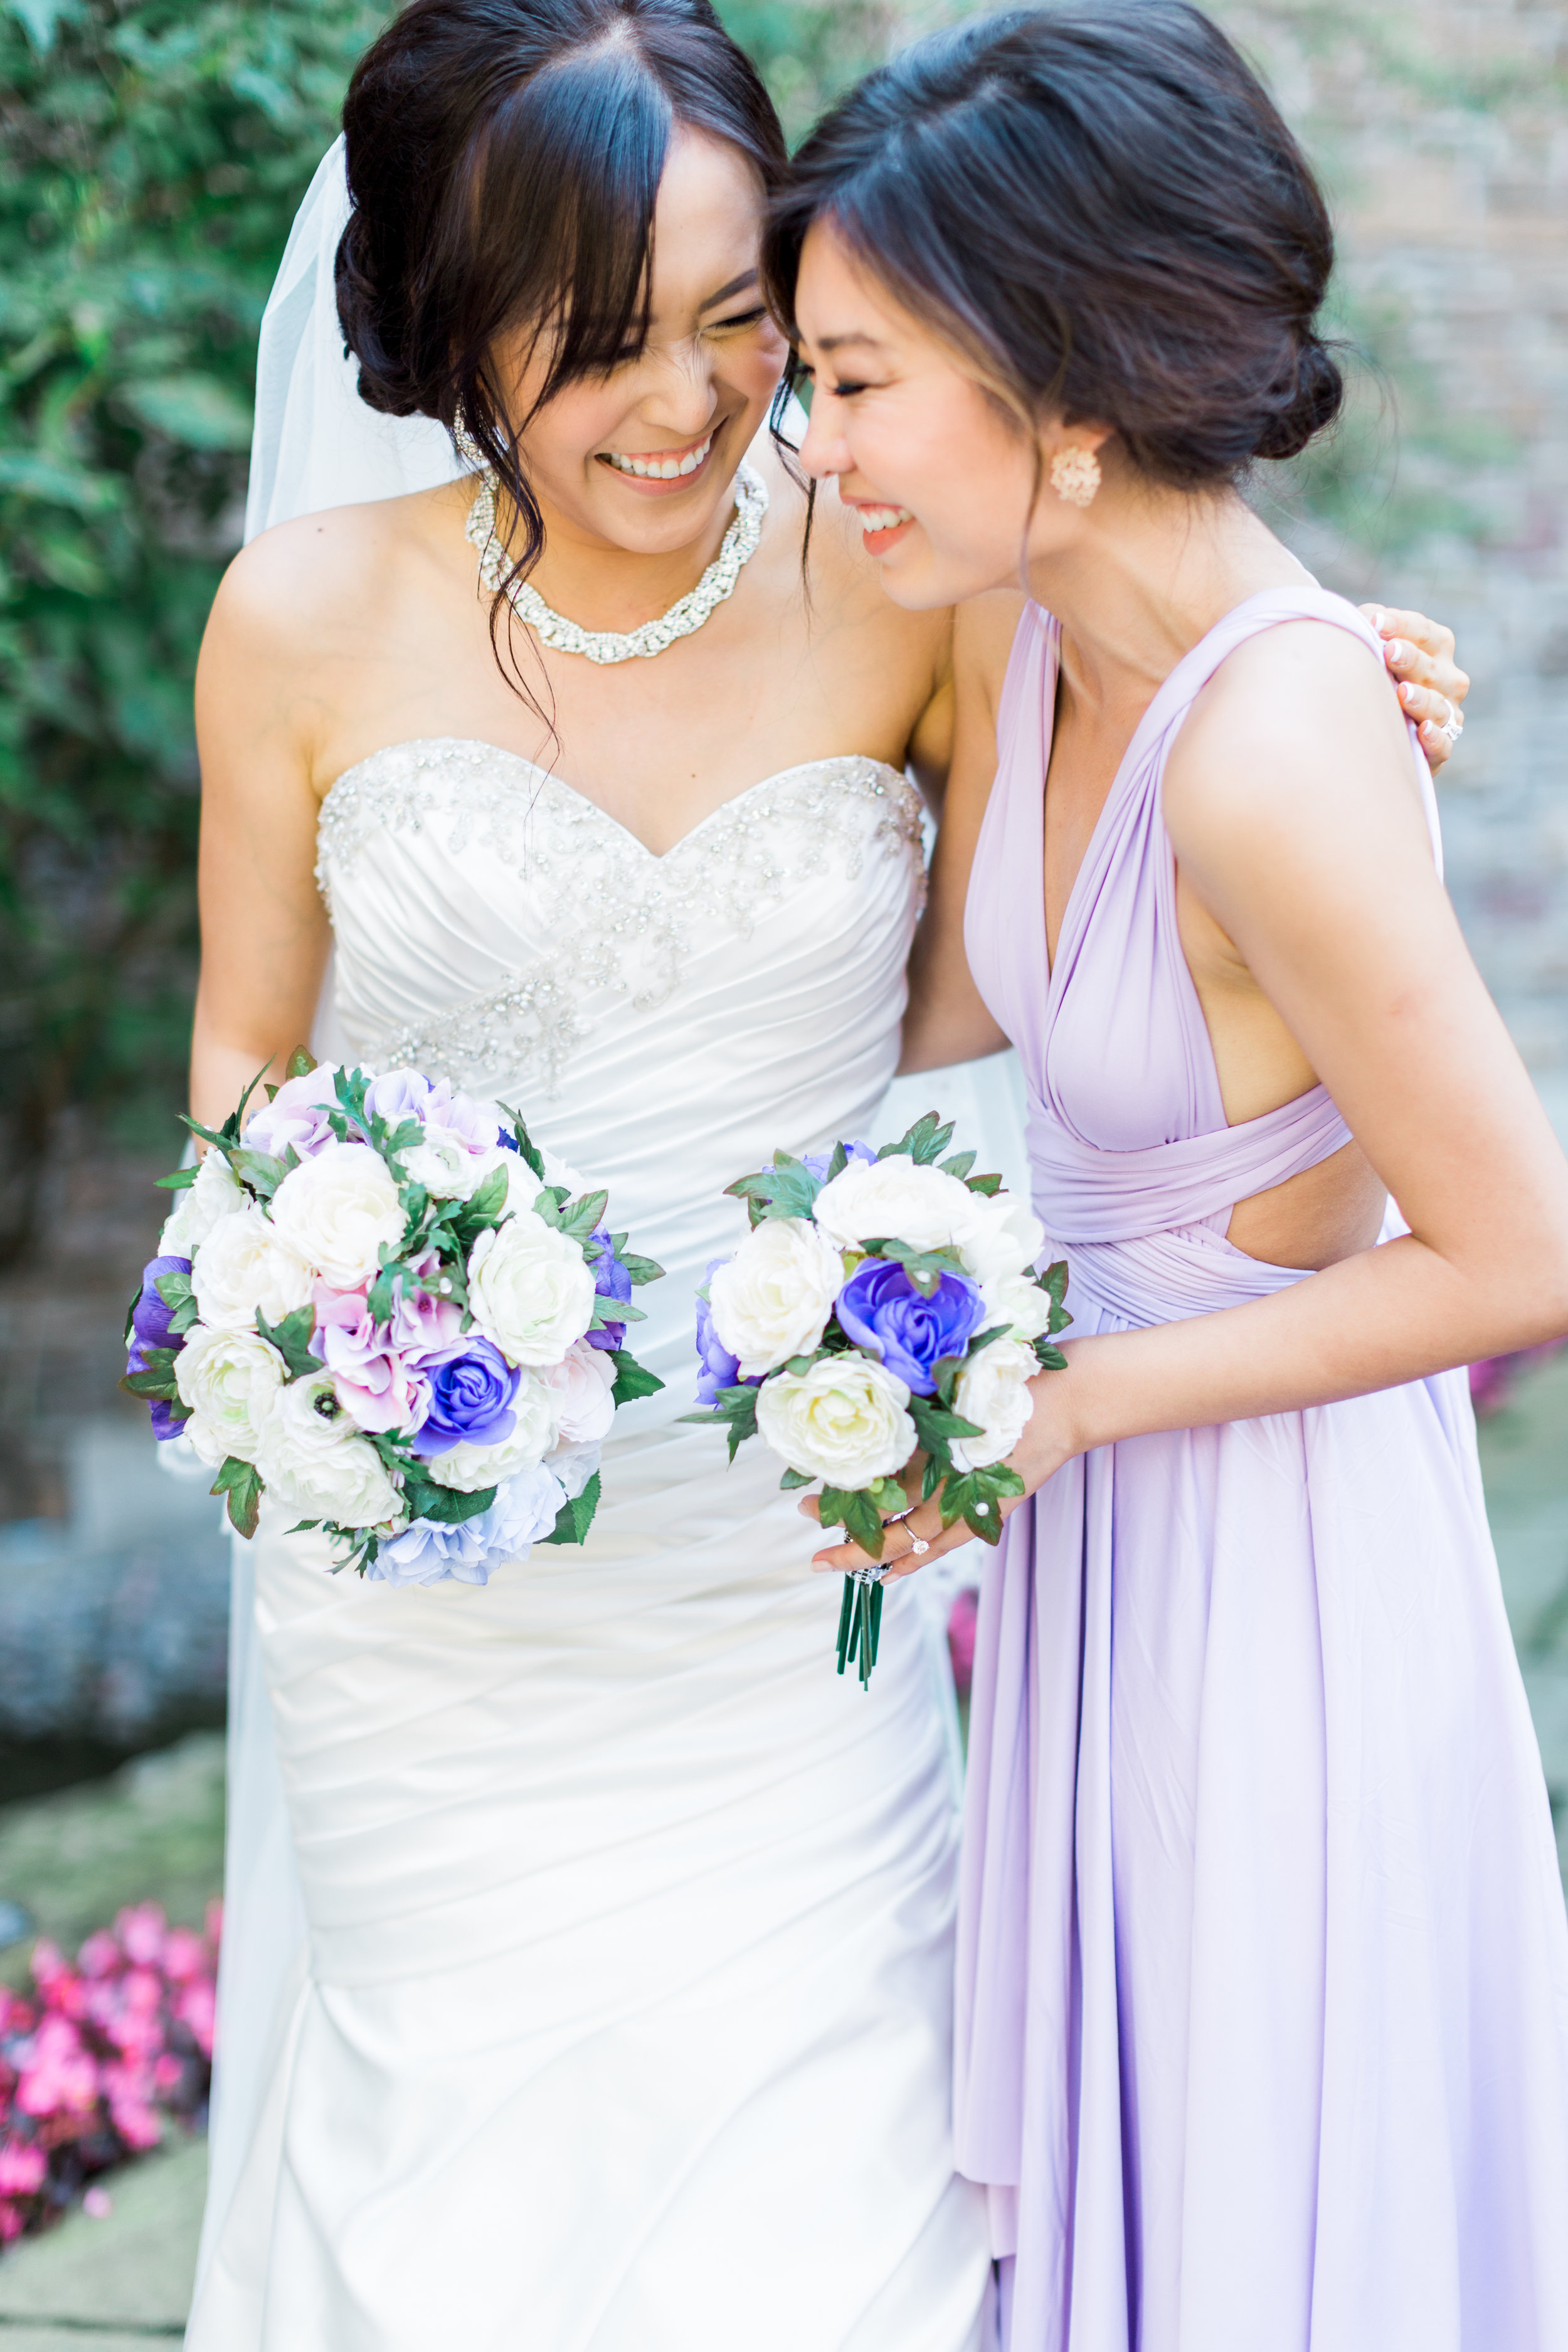 Toronto Fine Art Photographer - Old Mill Wedding - Bridesmaids Photos-30.jpg